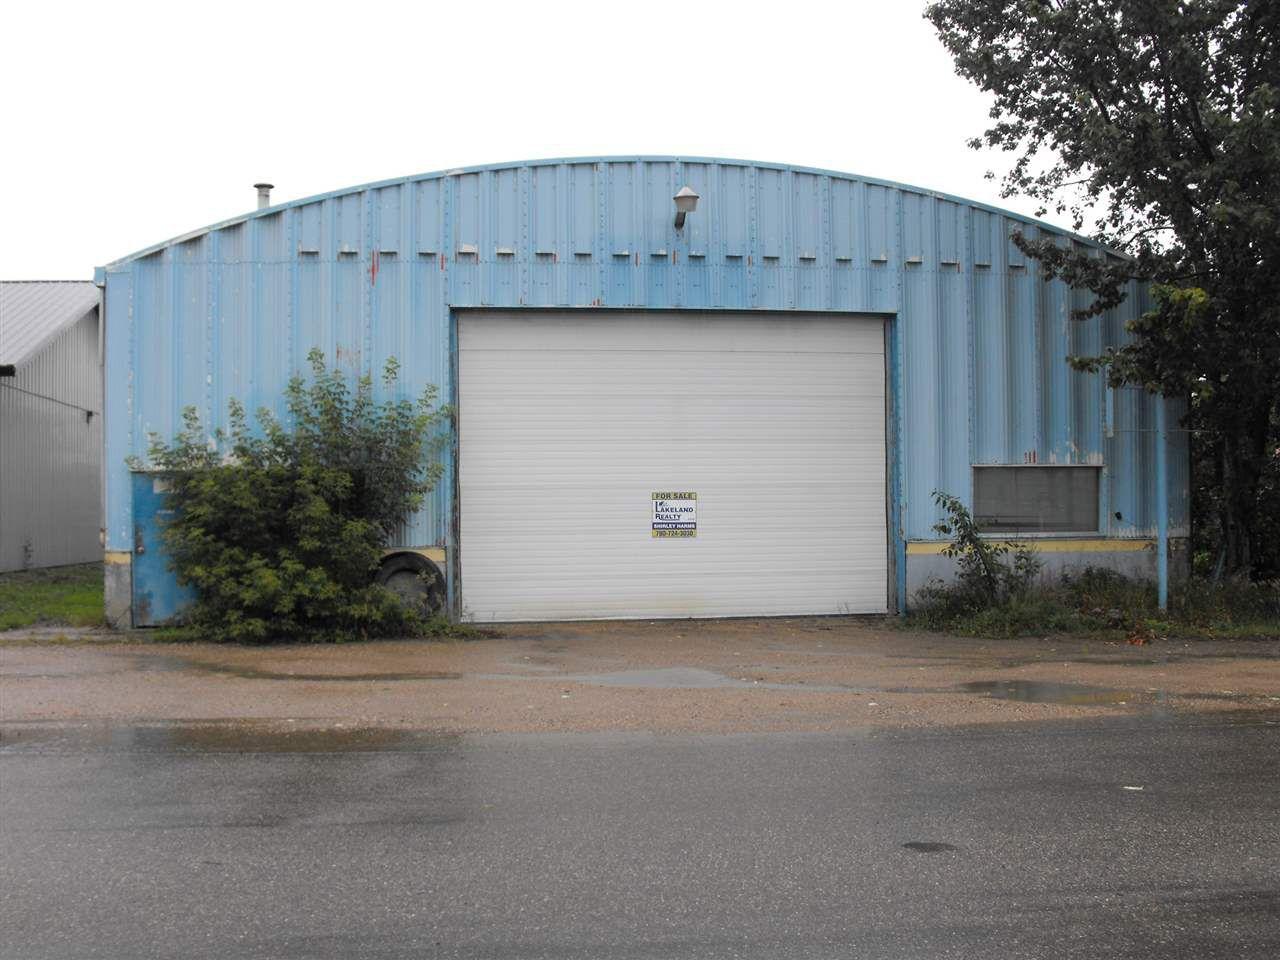 Main Photo: 4914 Railway Avenue: Elk Point Industrial for sale : MLS®# E4135477